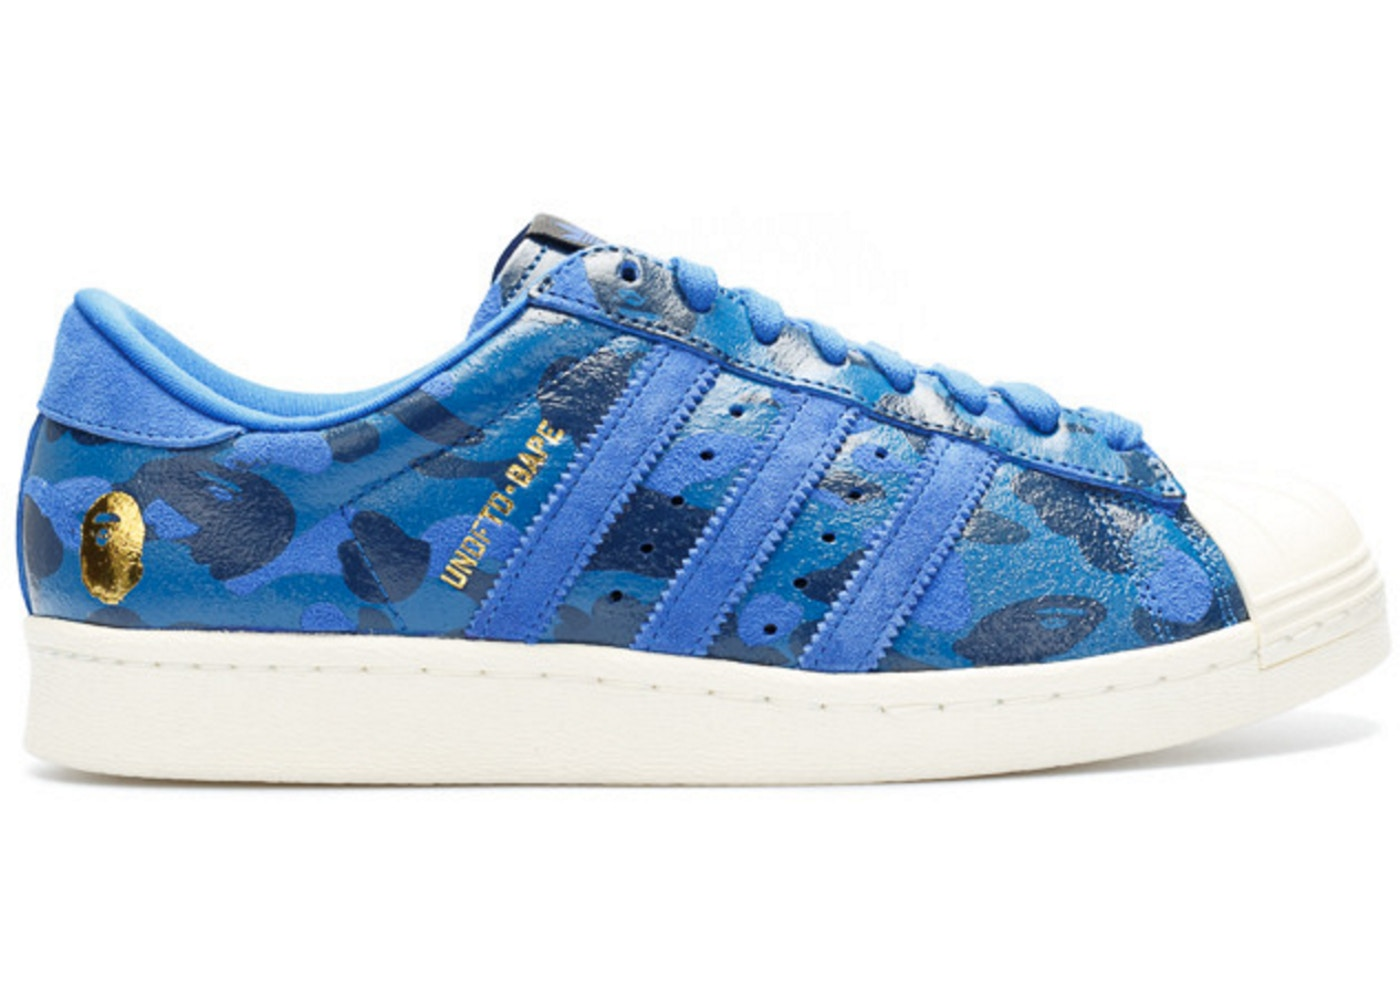 b52673d08c65 adidas Superstar 80s Undftd Bape Blue Camo - S74775